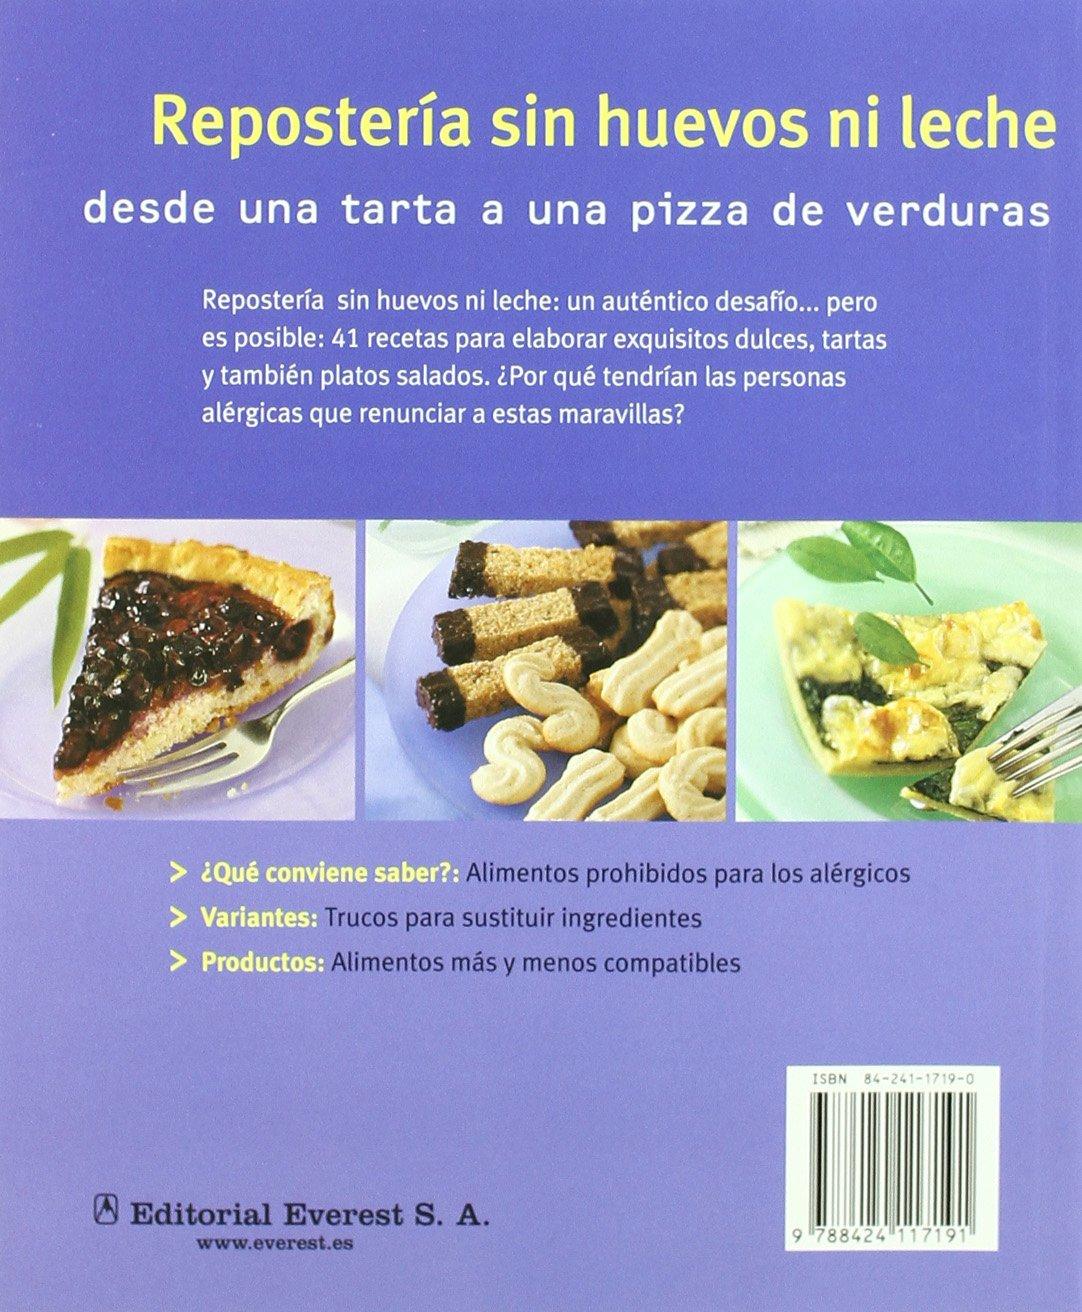 Reposteria Sin Huevos Ni Leche (Spanish Edition): Ilka Saager: 9788424117191: Amazon.com: Books